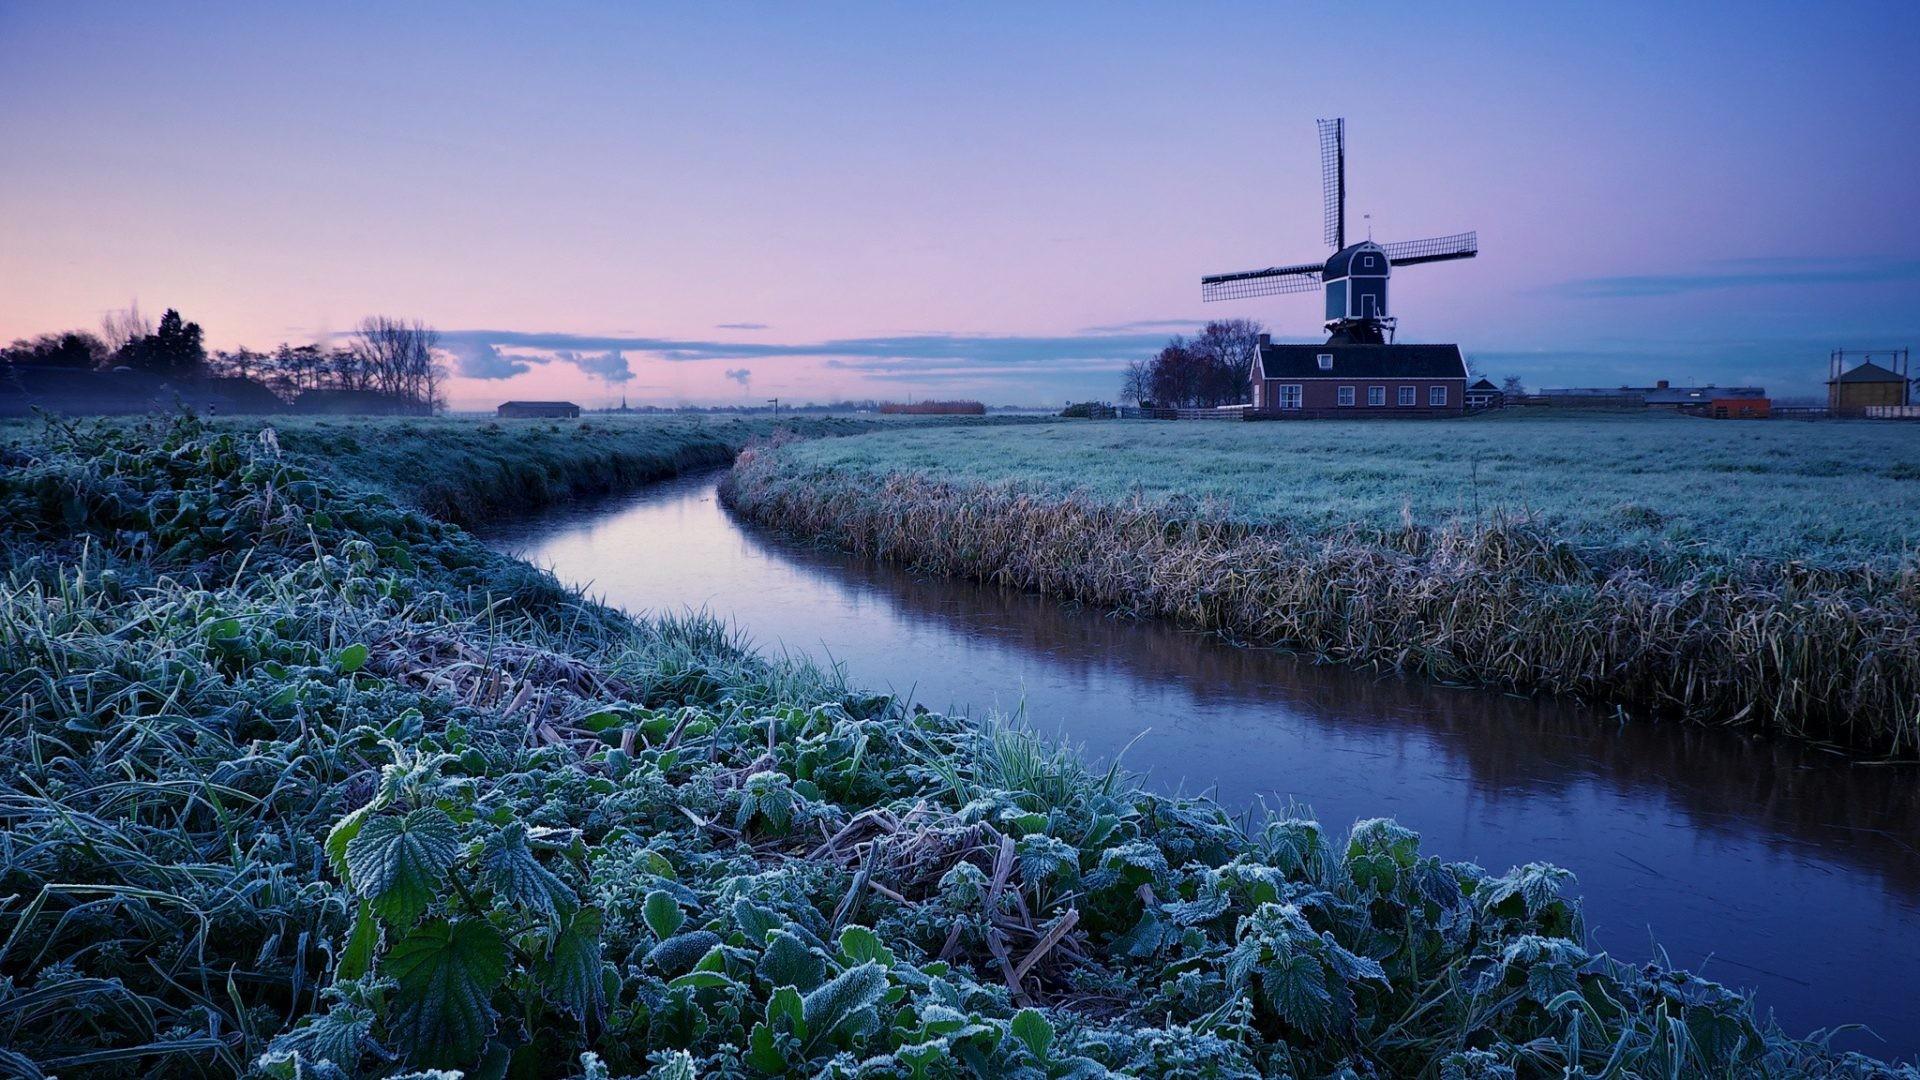 Monuments – Windmills Zima Utro Rassvet Niderlandy Kinderdijk Holland Dutch  Image for HD 16:9